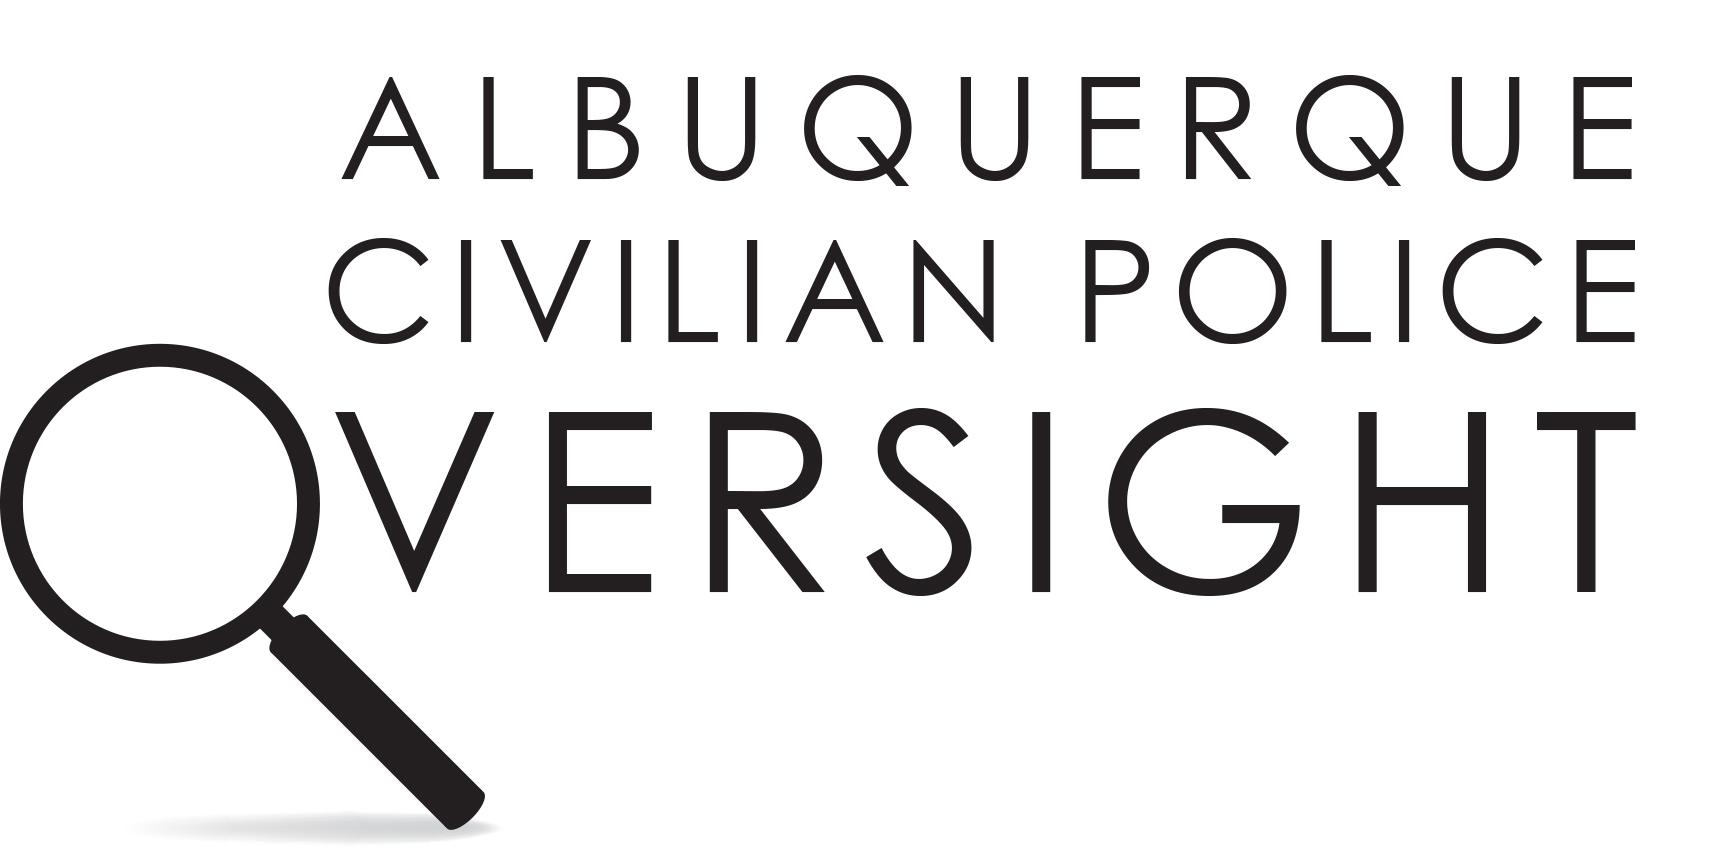 Civilian Police Oversight Agency logo.